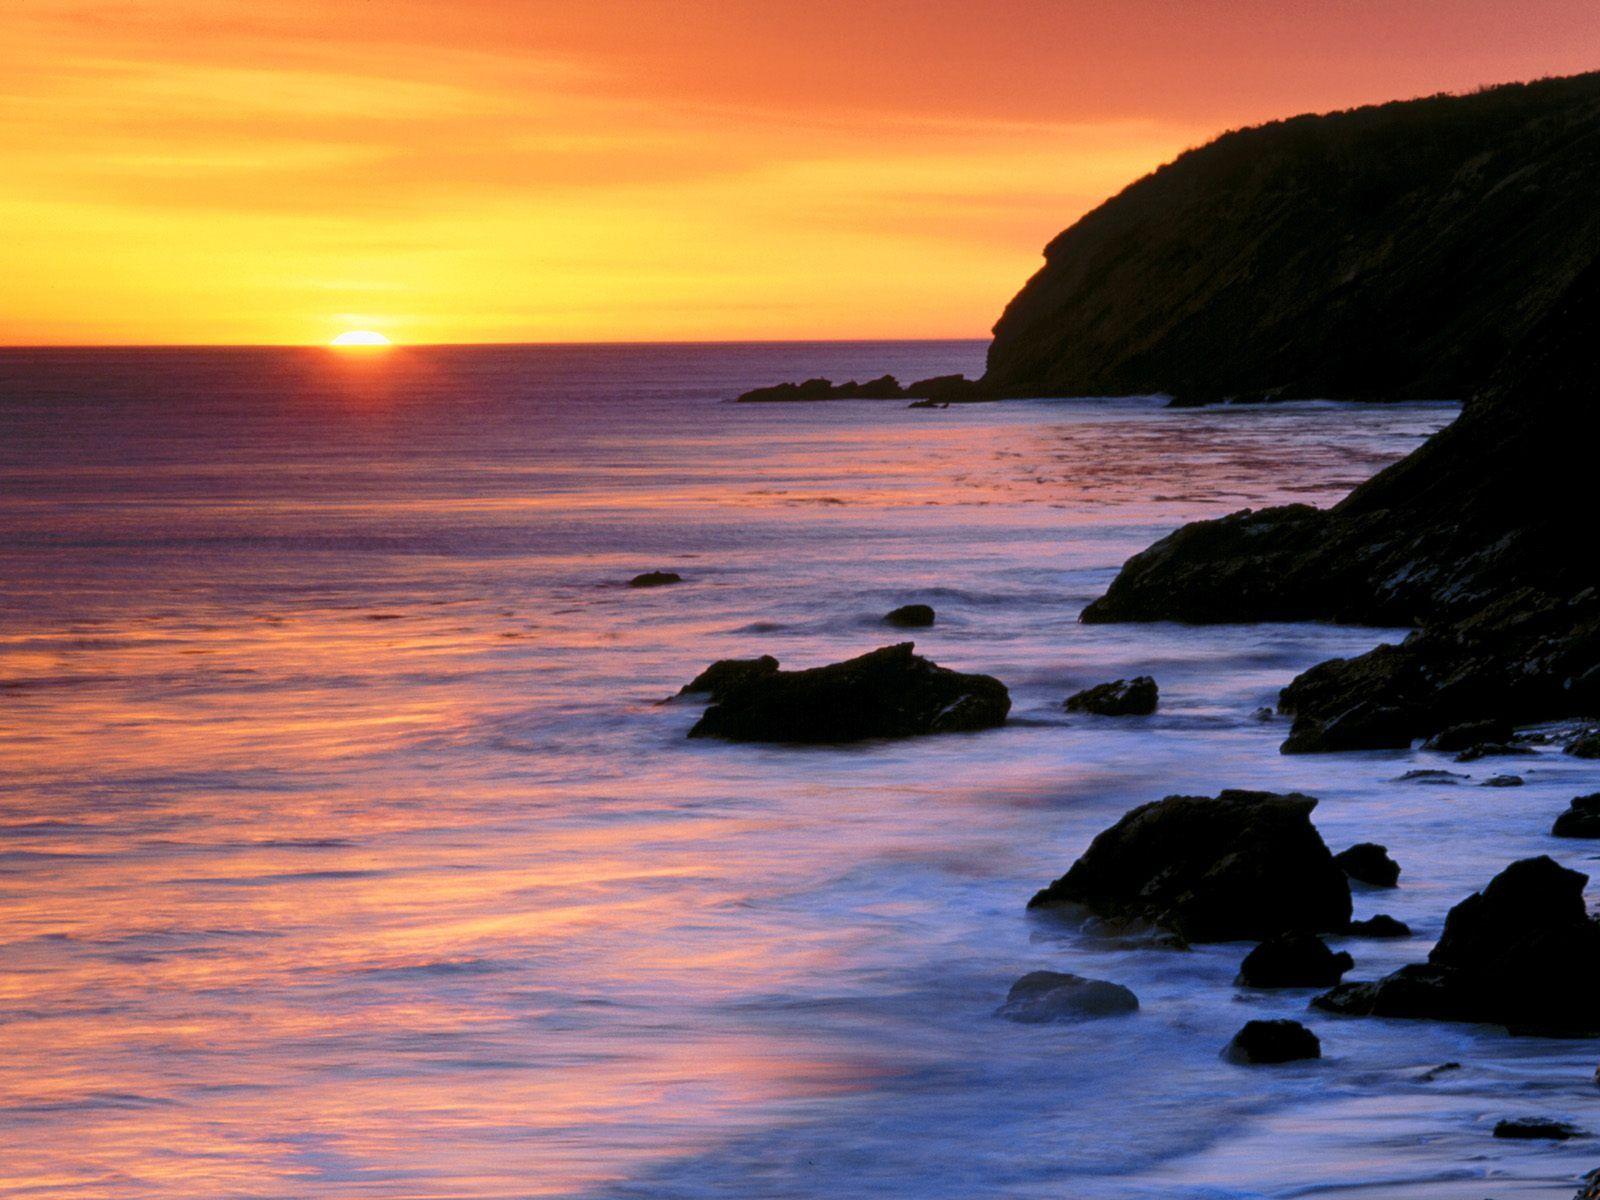 Cali Sunset Sunset Landscape Ocean Pictures